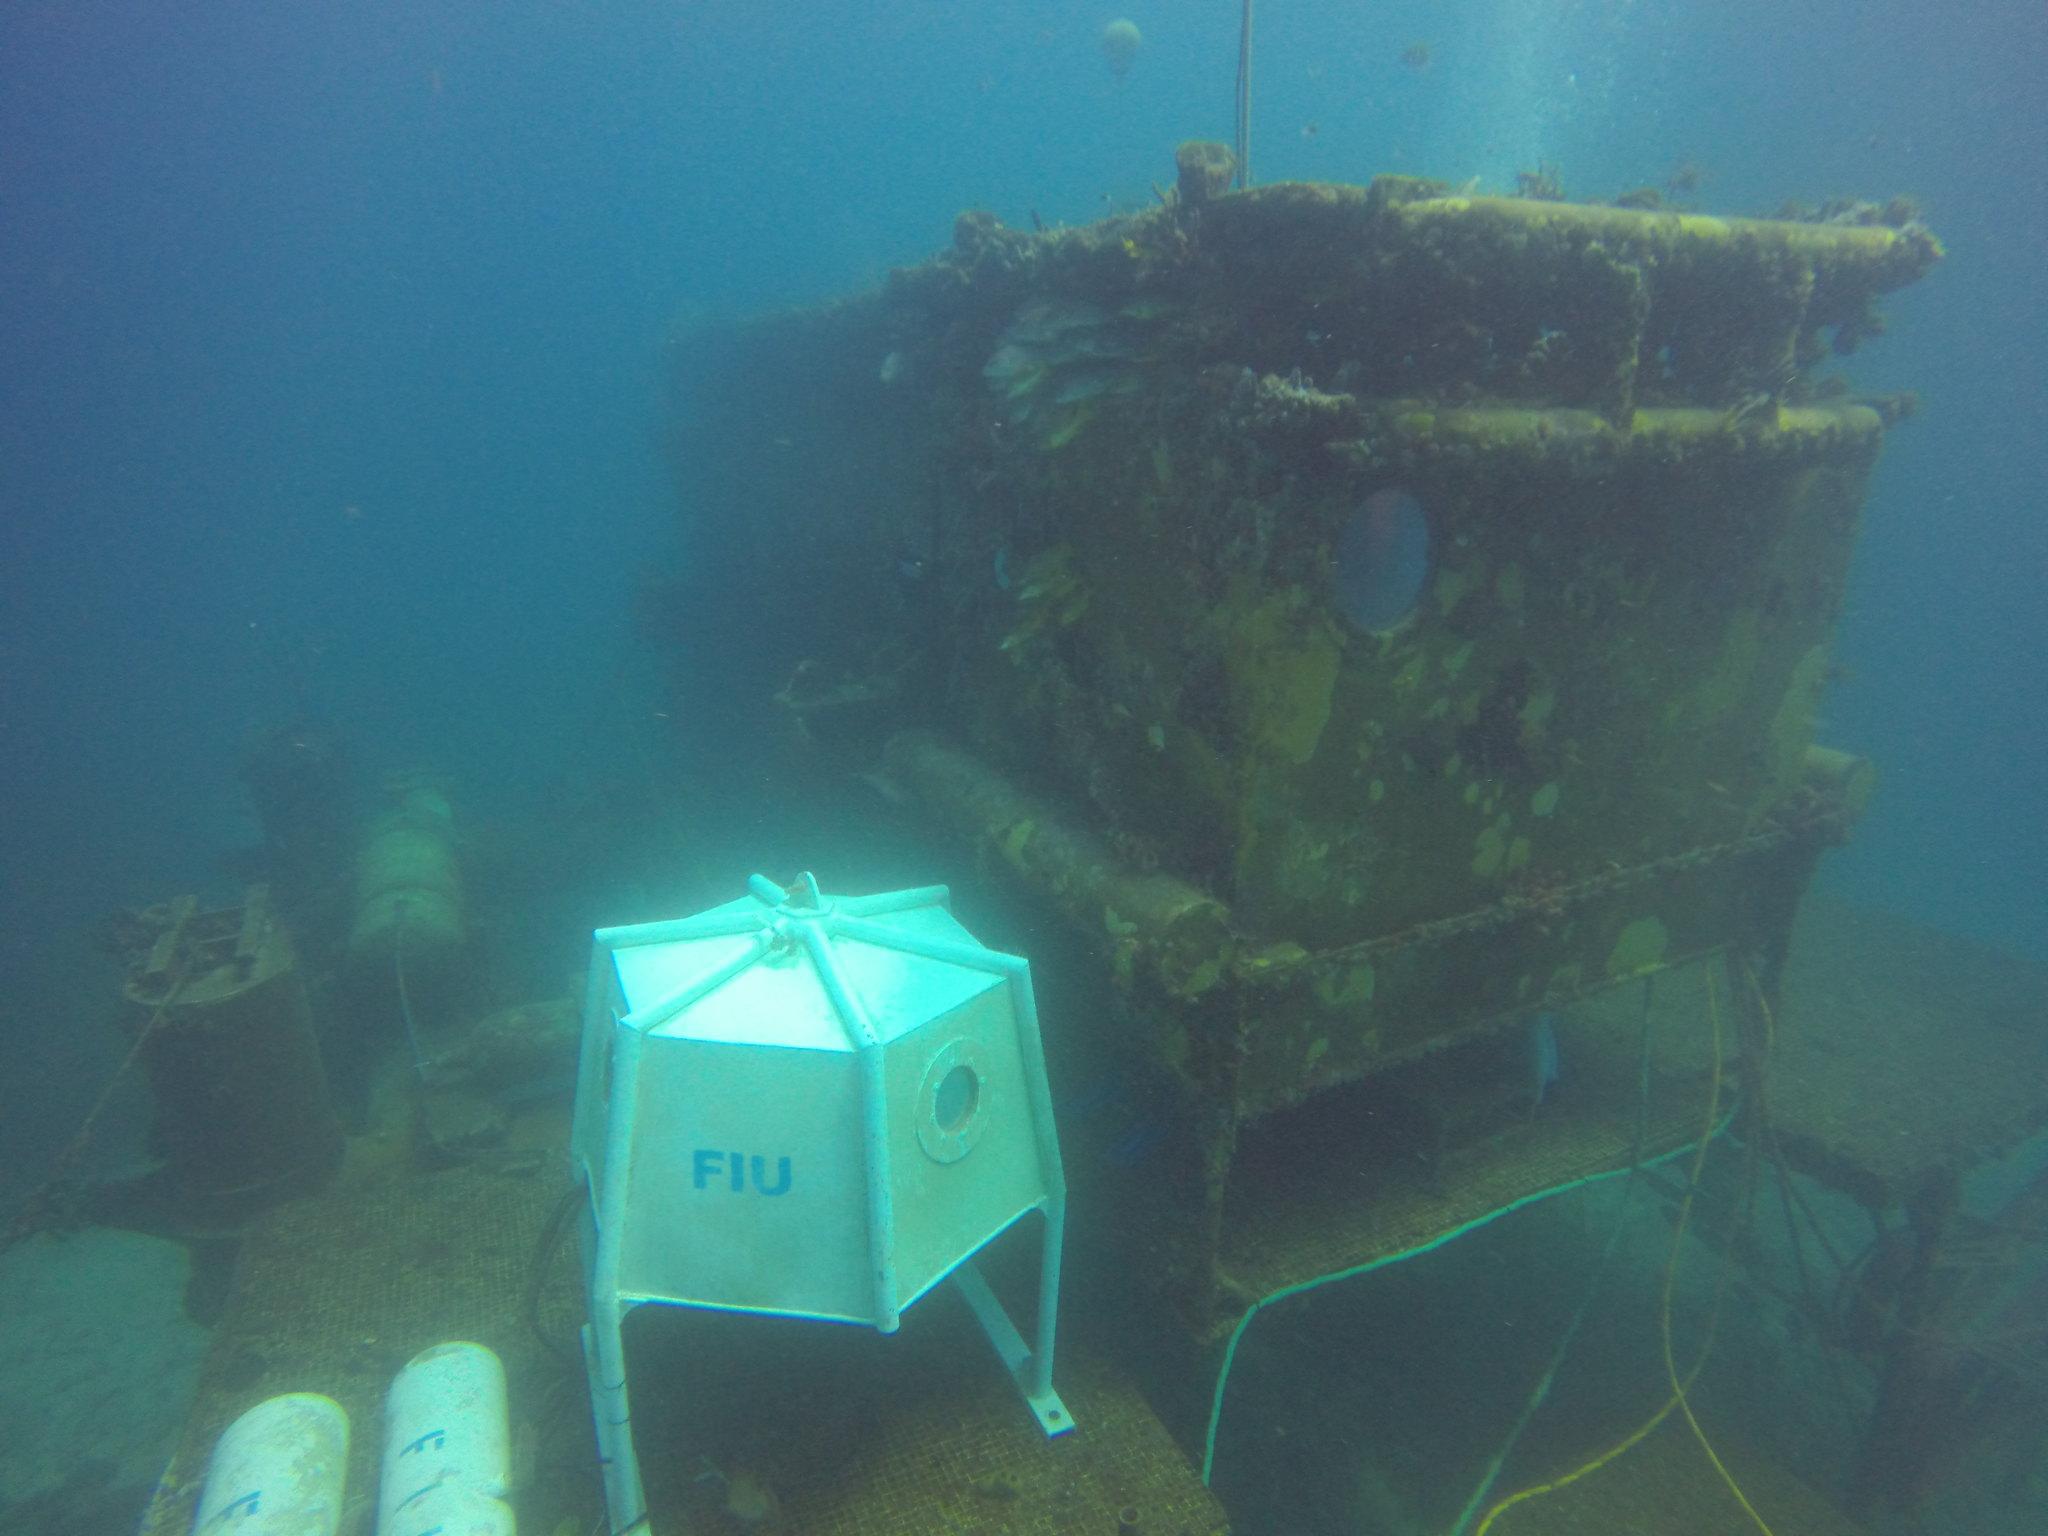 Aquarius habitat, home to the NEEMO 20 crew for 14 days (Photo courtesy of NASA)